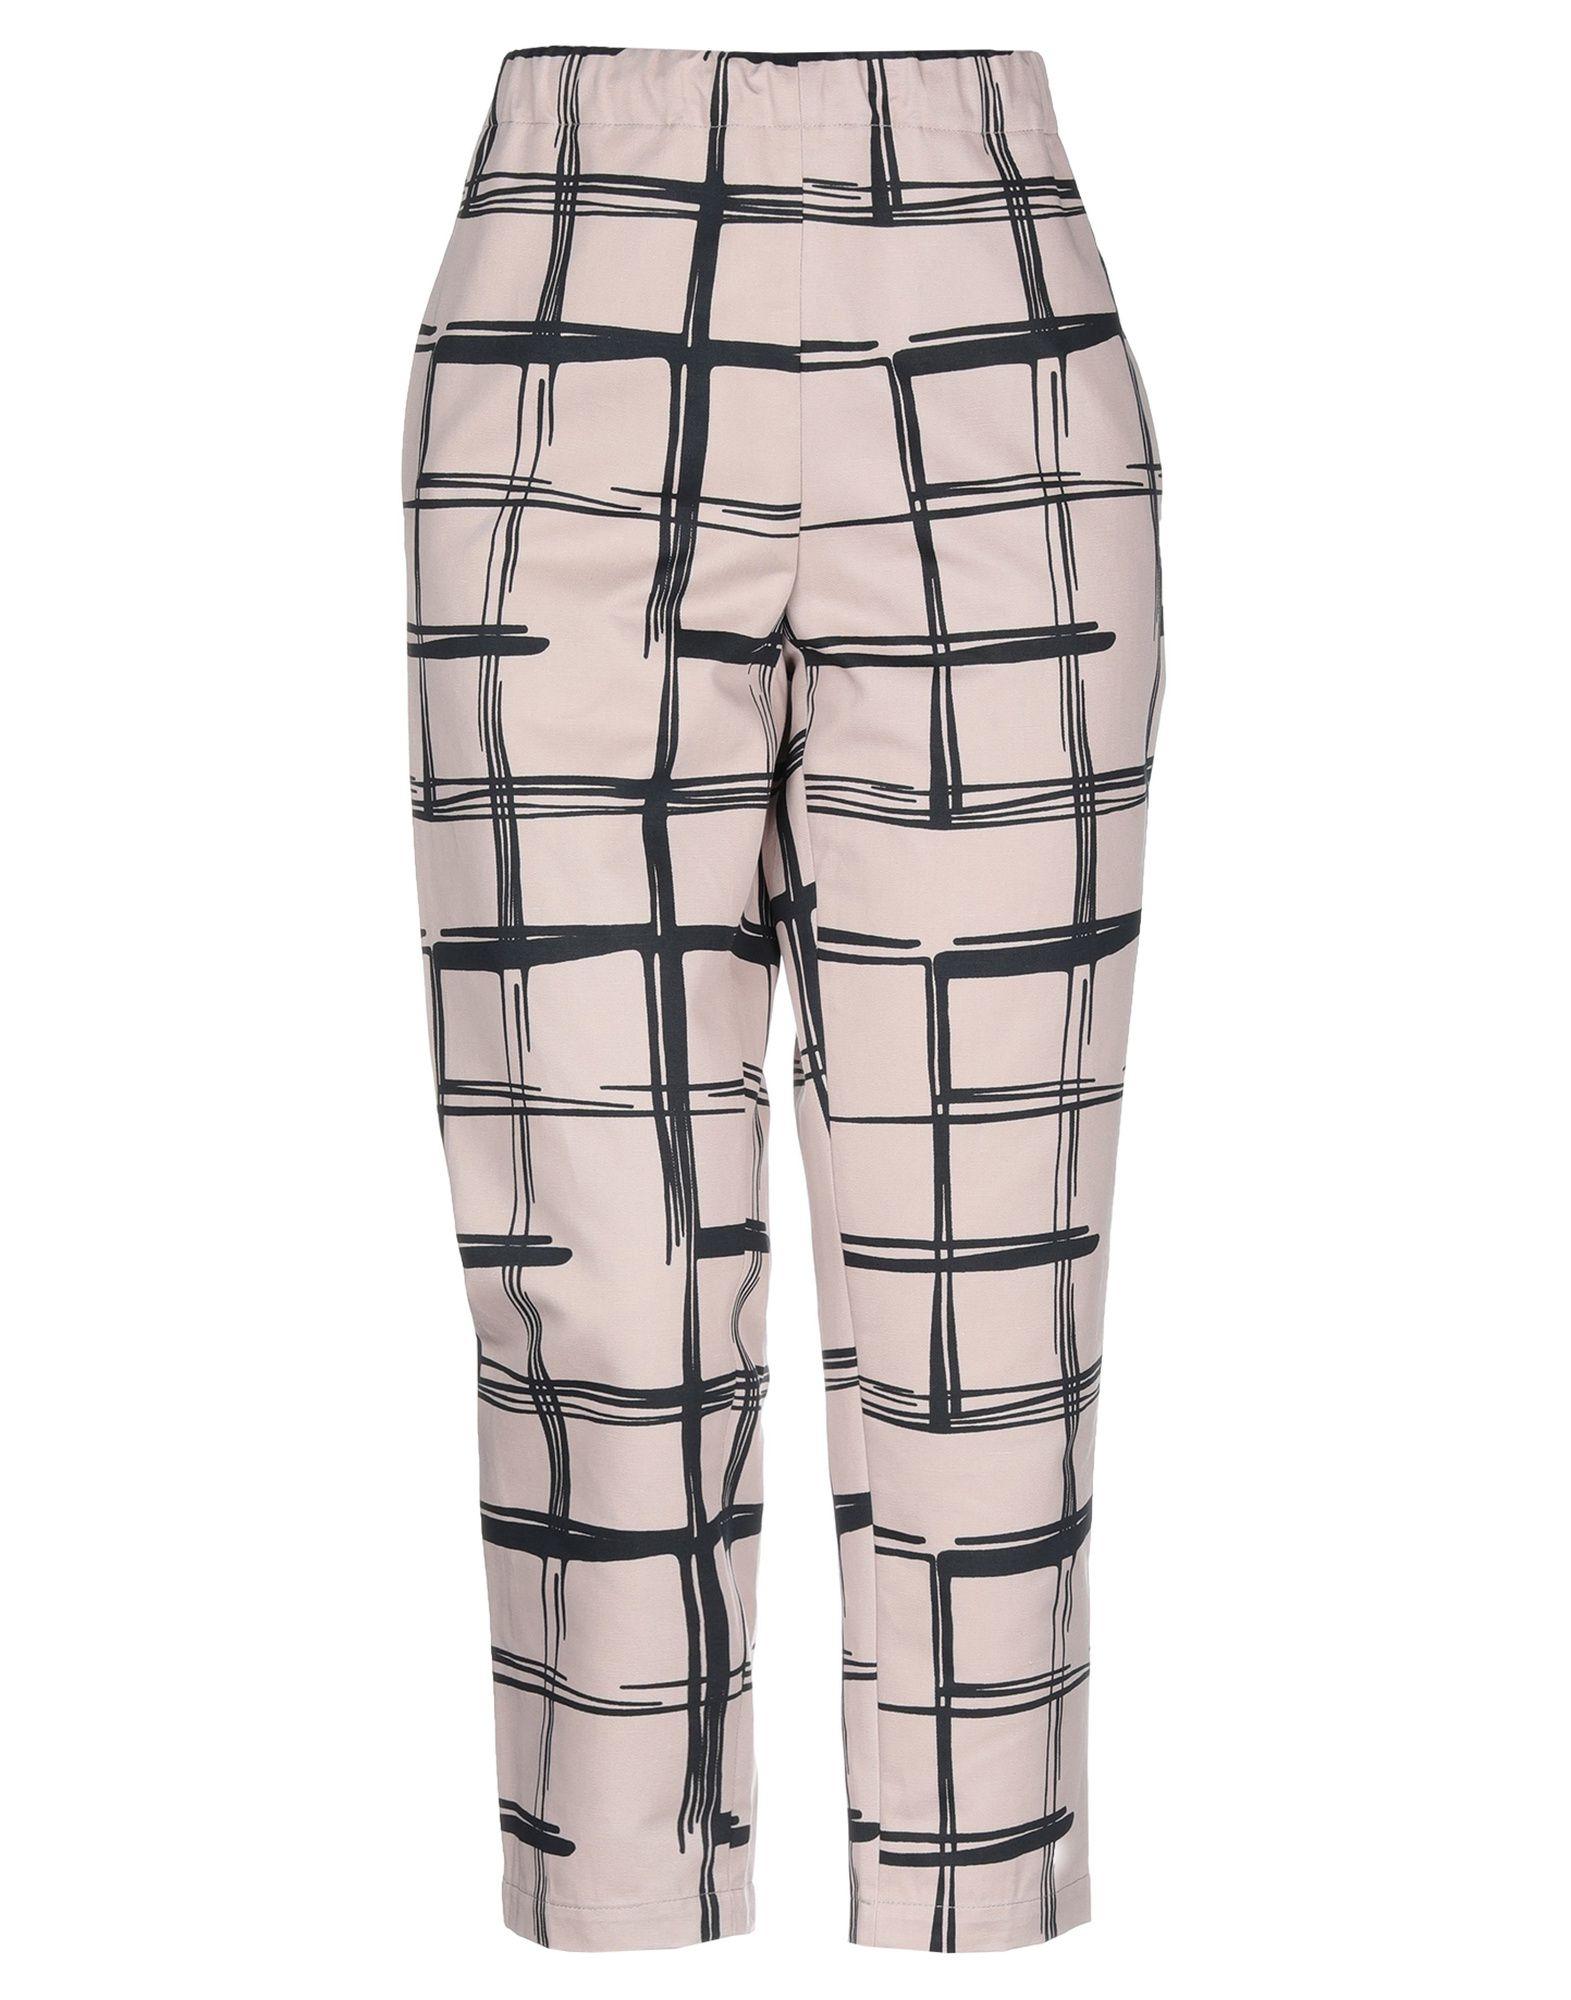 Pantalone Marni damen - 13299385MX